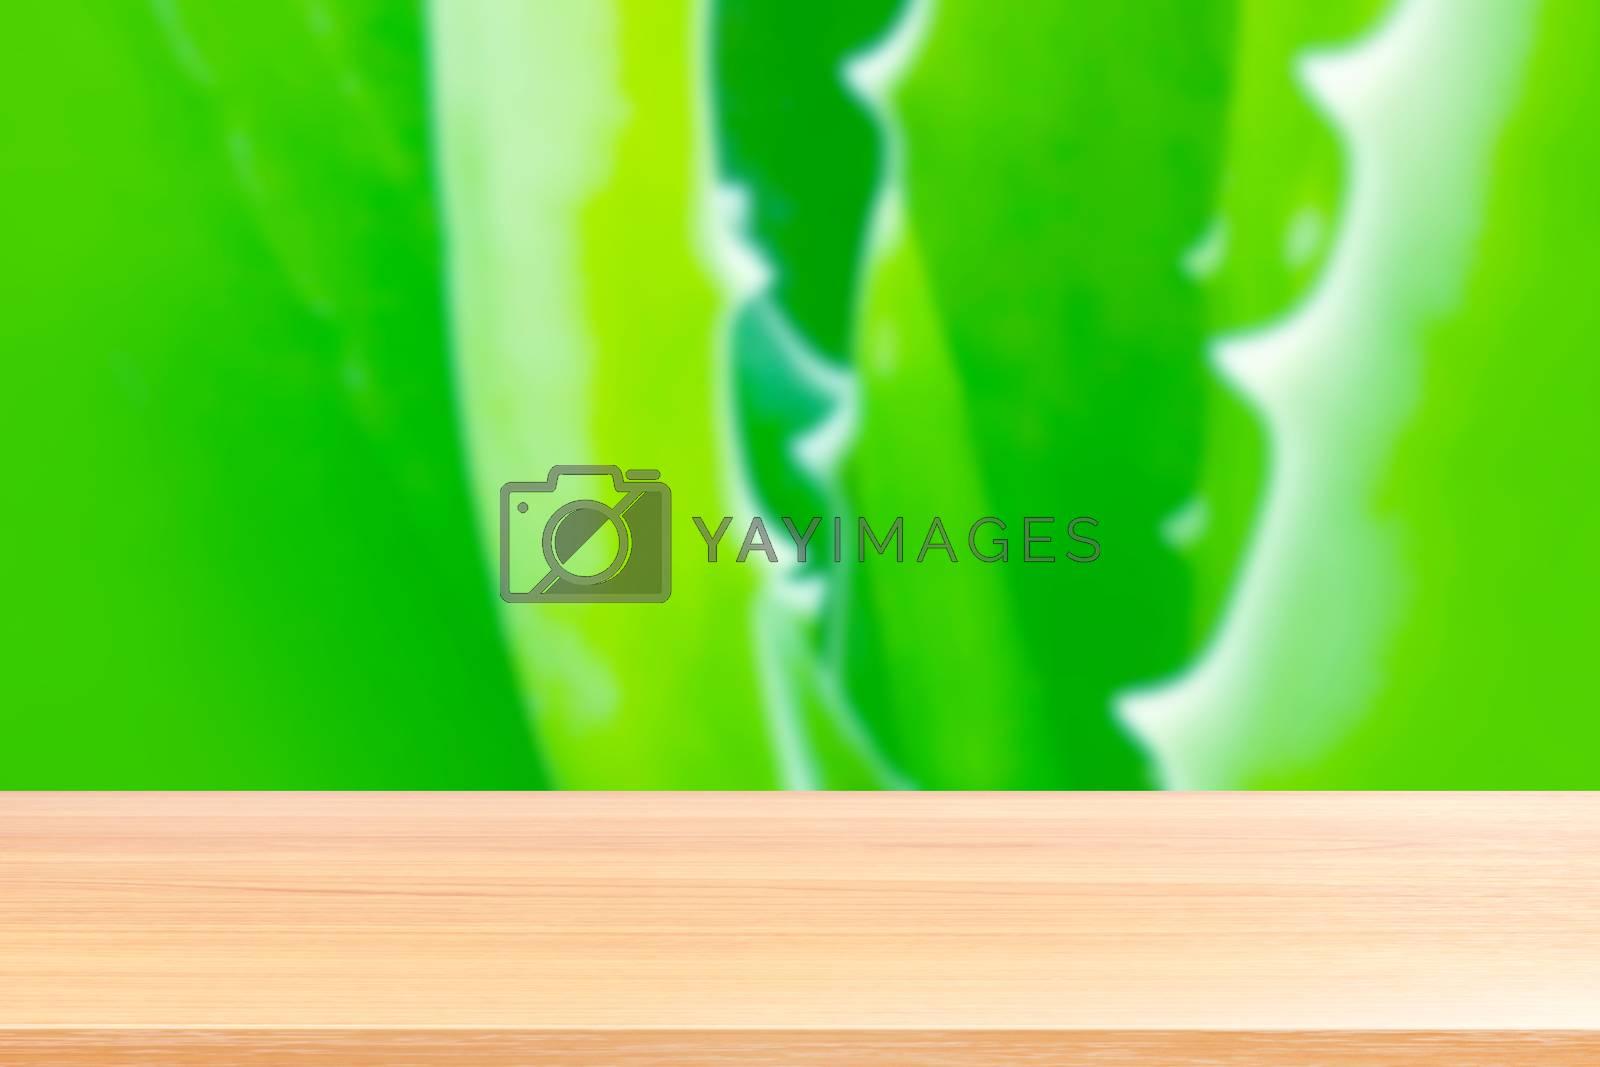 wood plank on aloe vera leaf blurred green fresh nature background, empty wood table floors on aloe vera blurred green fresh nature background, wood table board empty front aloe vera leaf fresh